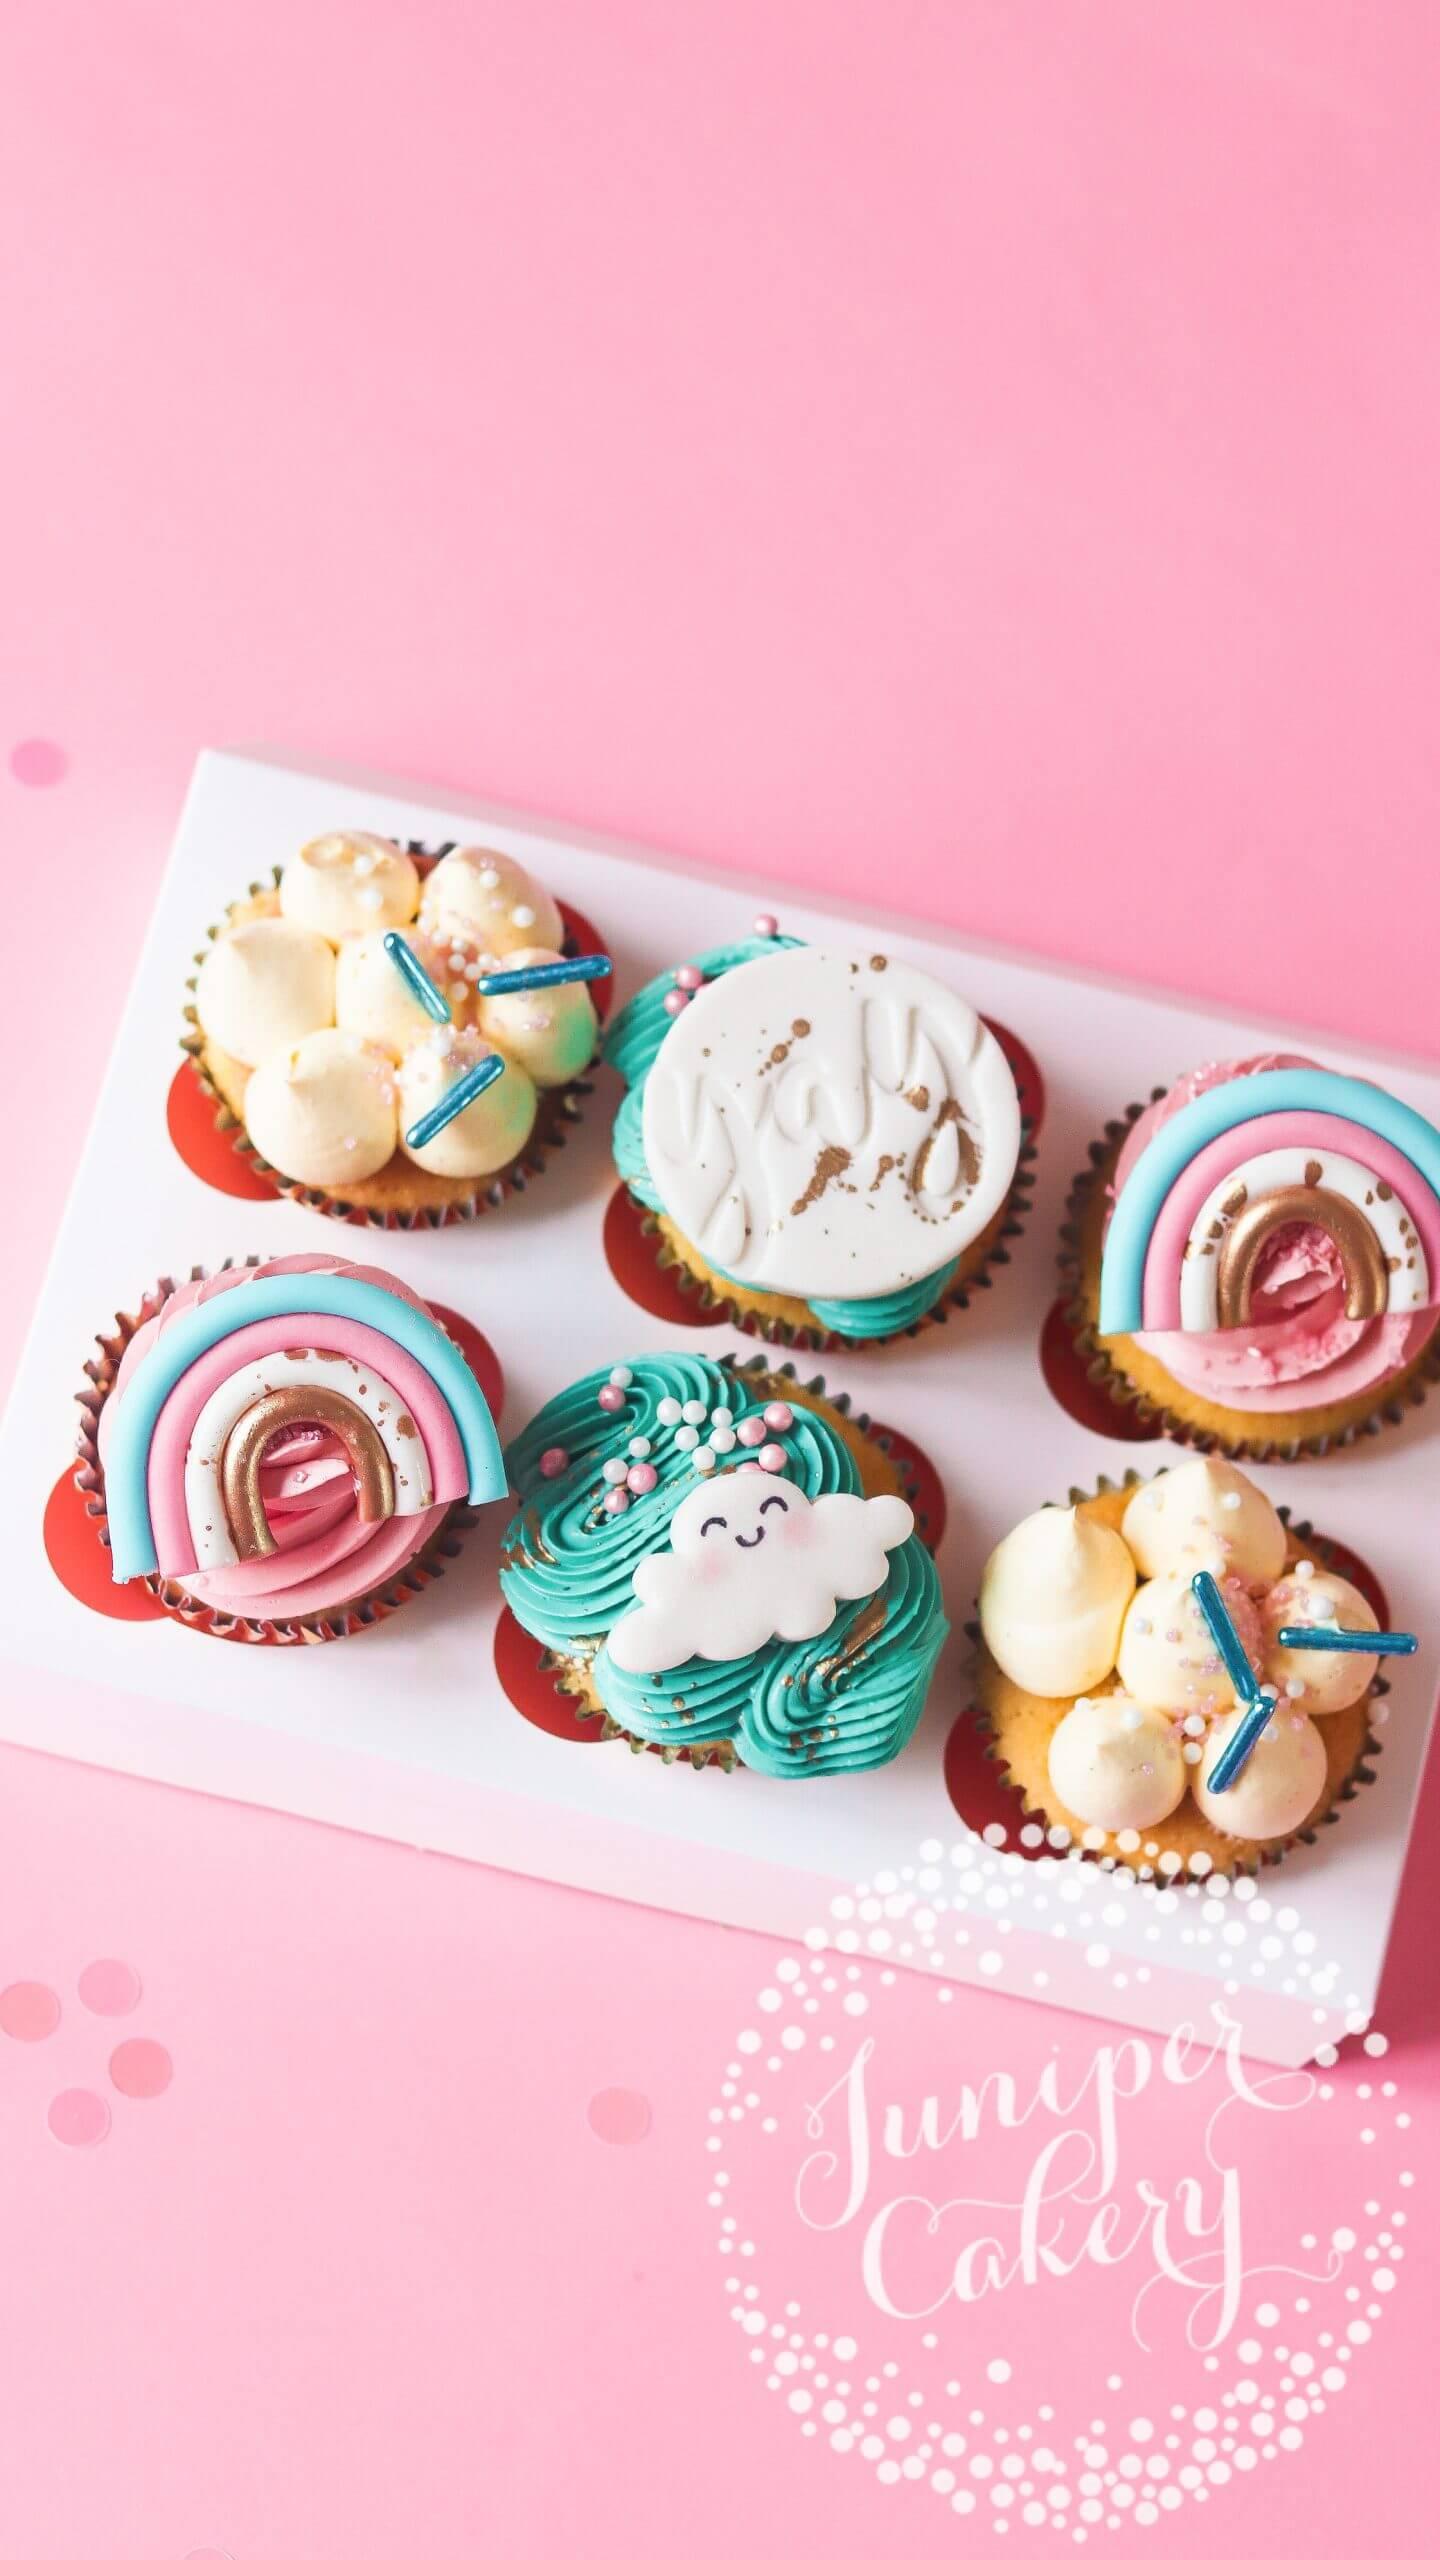 Rainbow Themed Cupcakes by Juniper Cakery